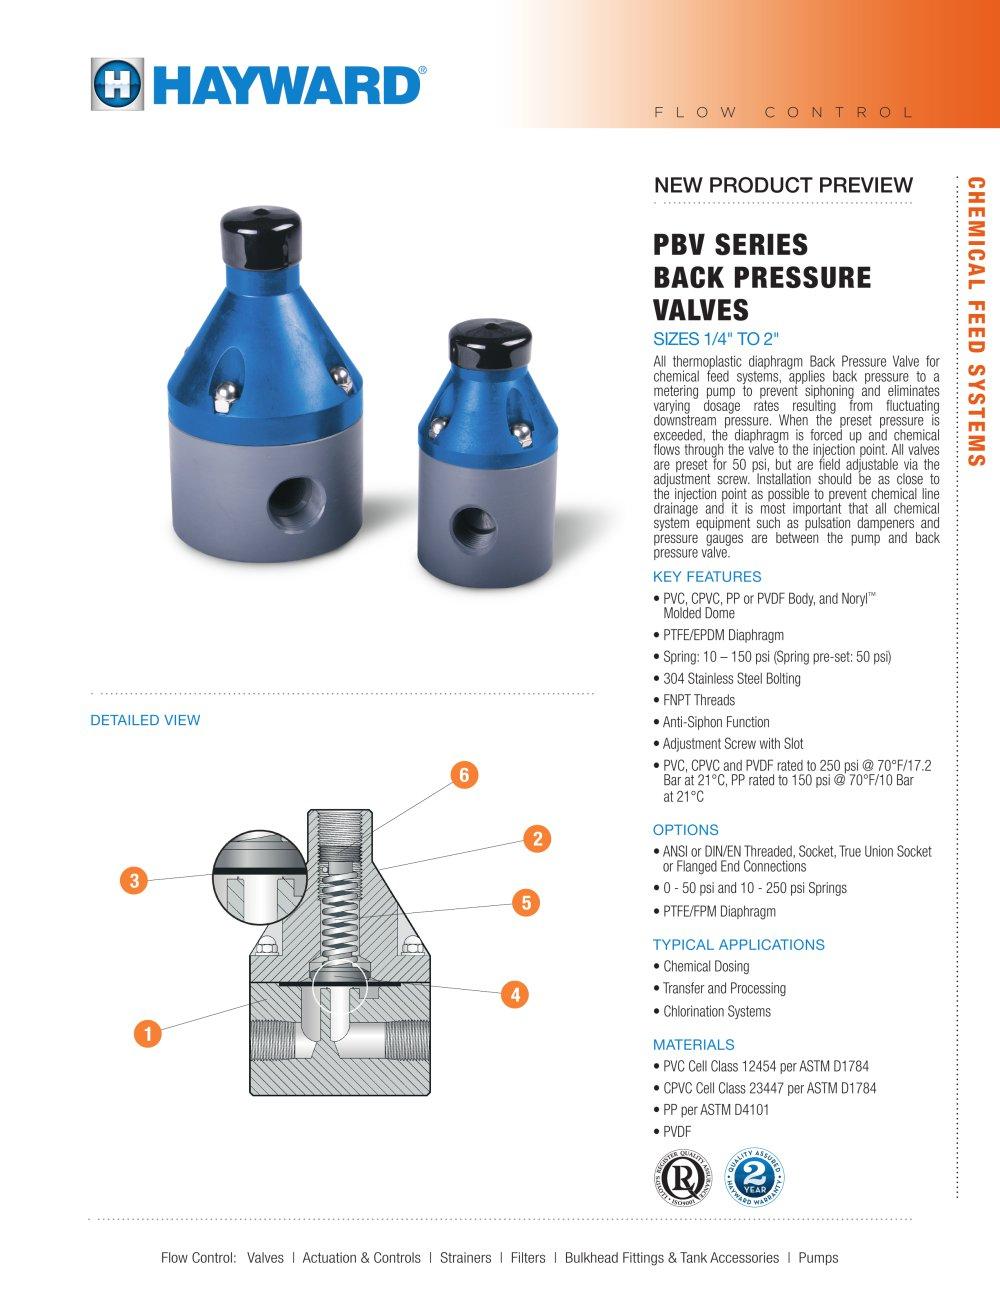 Npppbv0915 pbv series back pressure valves hayward industries npppbv0915 pbv series back pressure valves 1 2 pages ccuart Choice Image